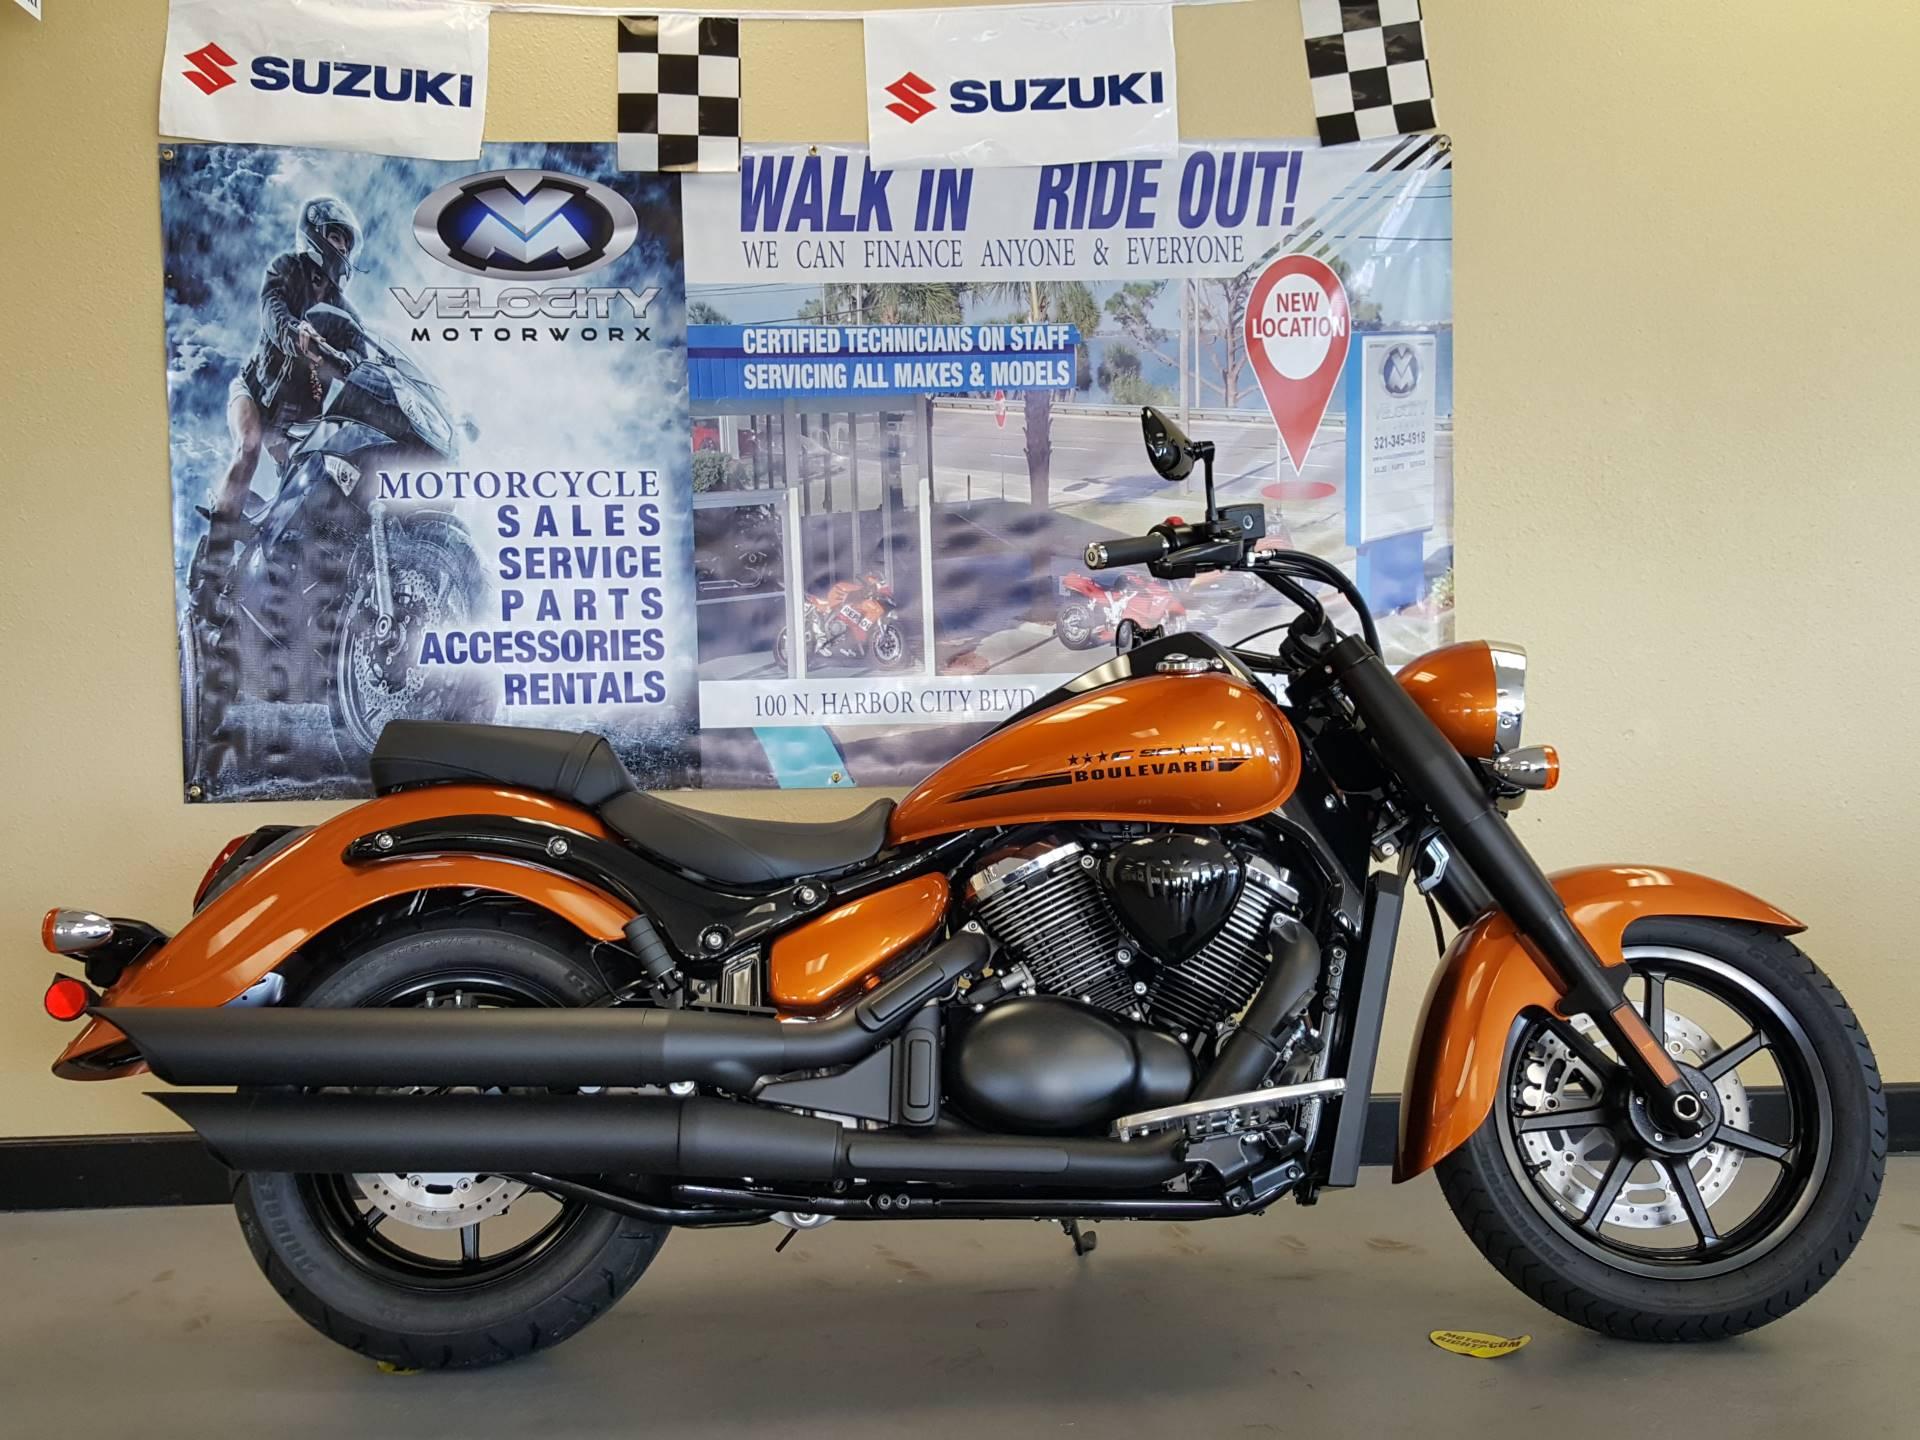 New 2017 Suzuki Boulevard C90 B.O.S.S. Motorcycles in Melbourne, FL